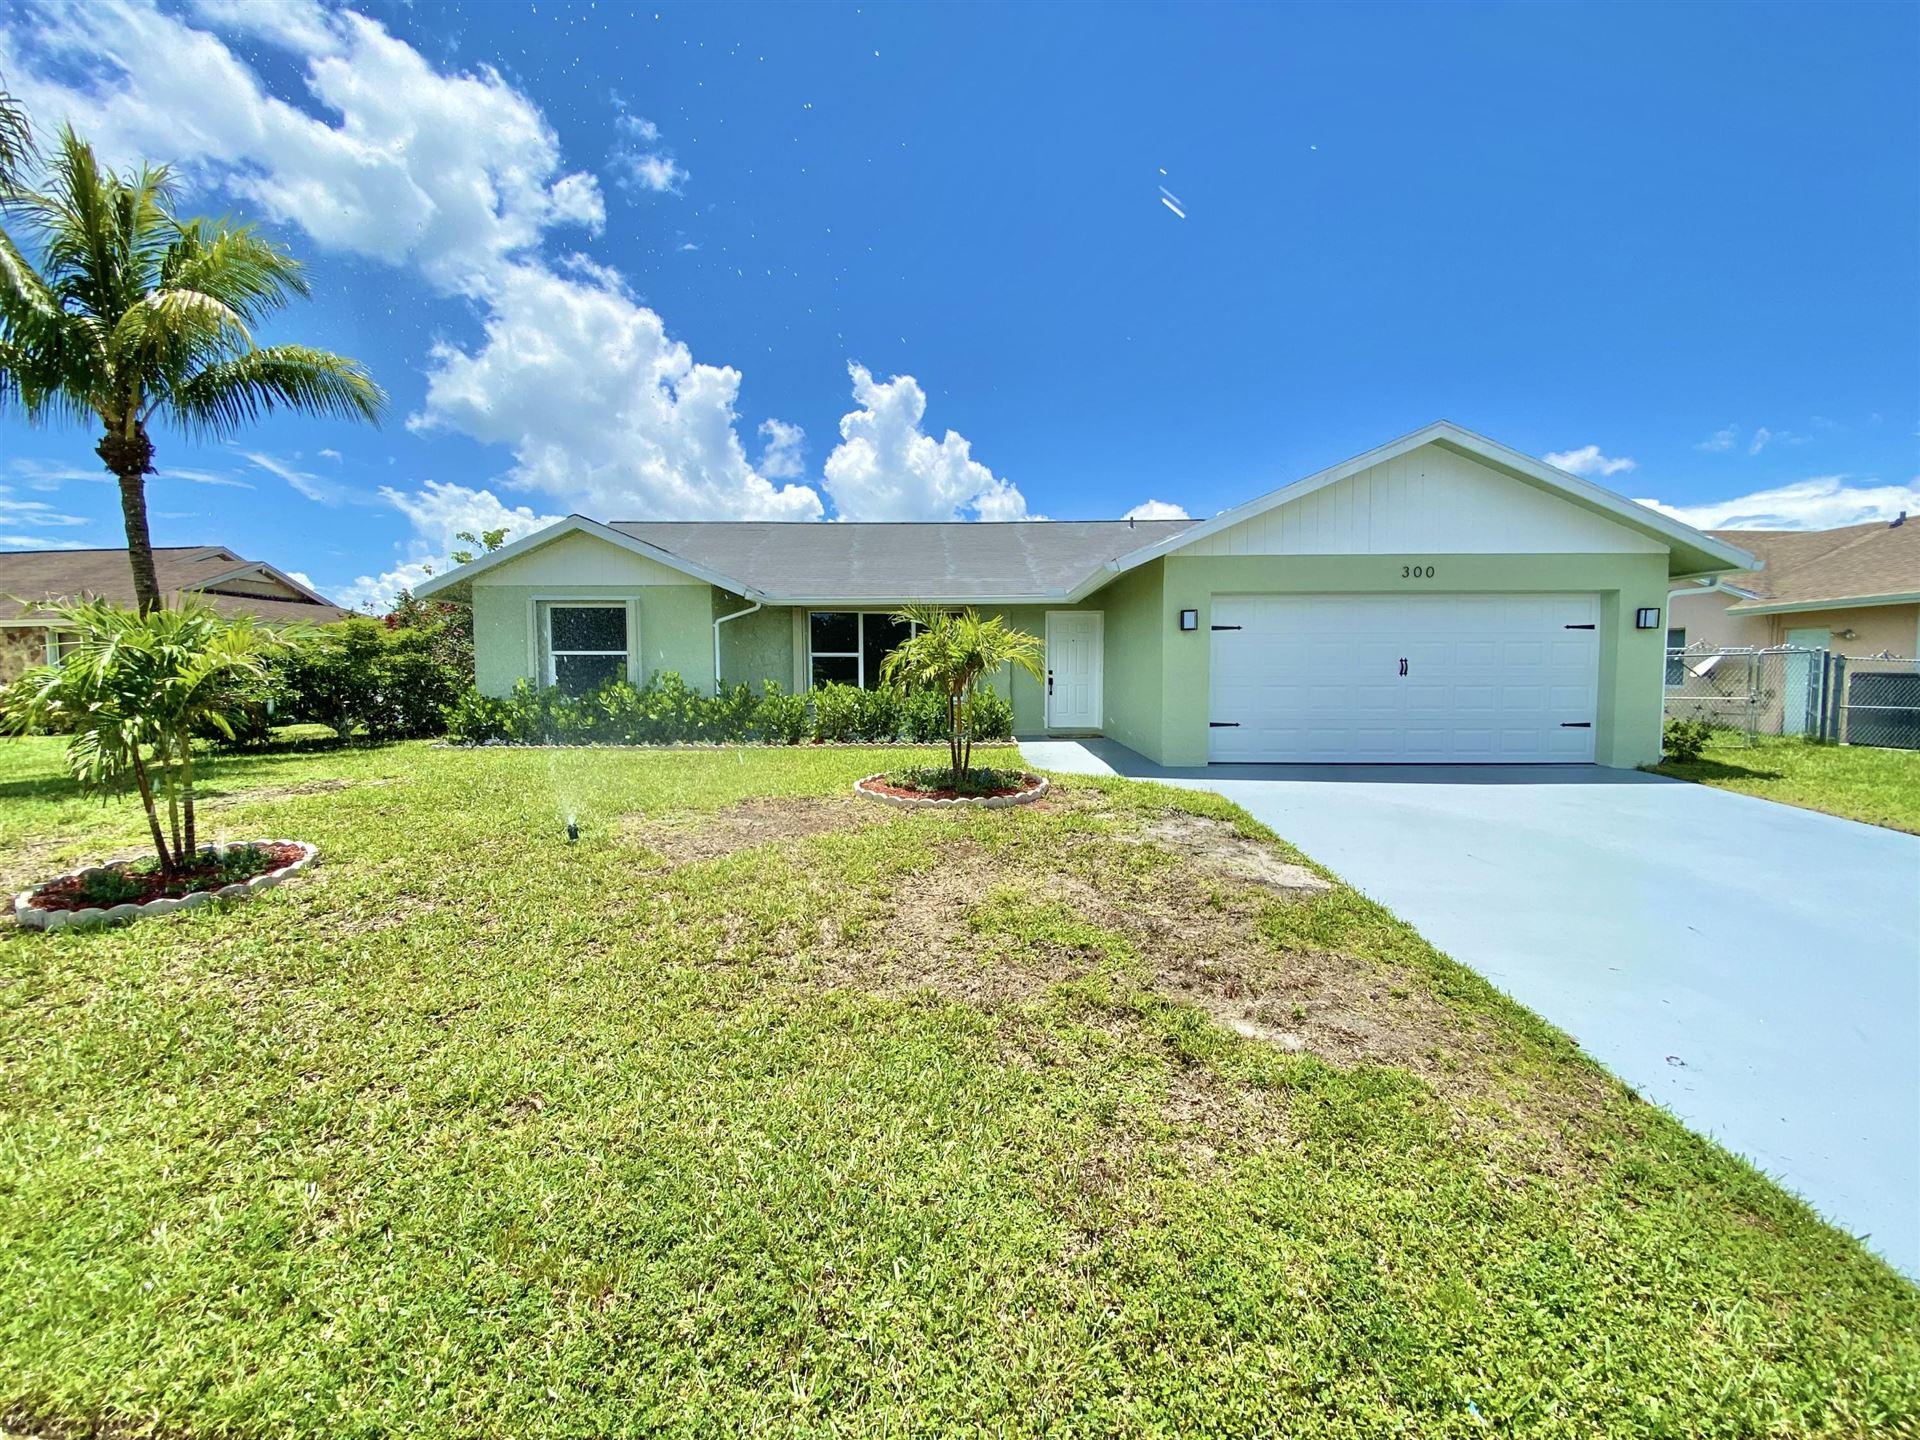 Photo of 300 La Mancha Avenue, Royal Palm Beach, FL 33411 (MLS # RX-10726482)